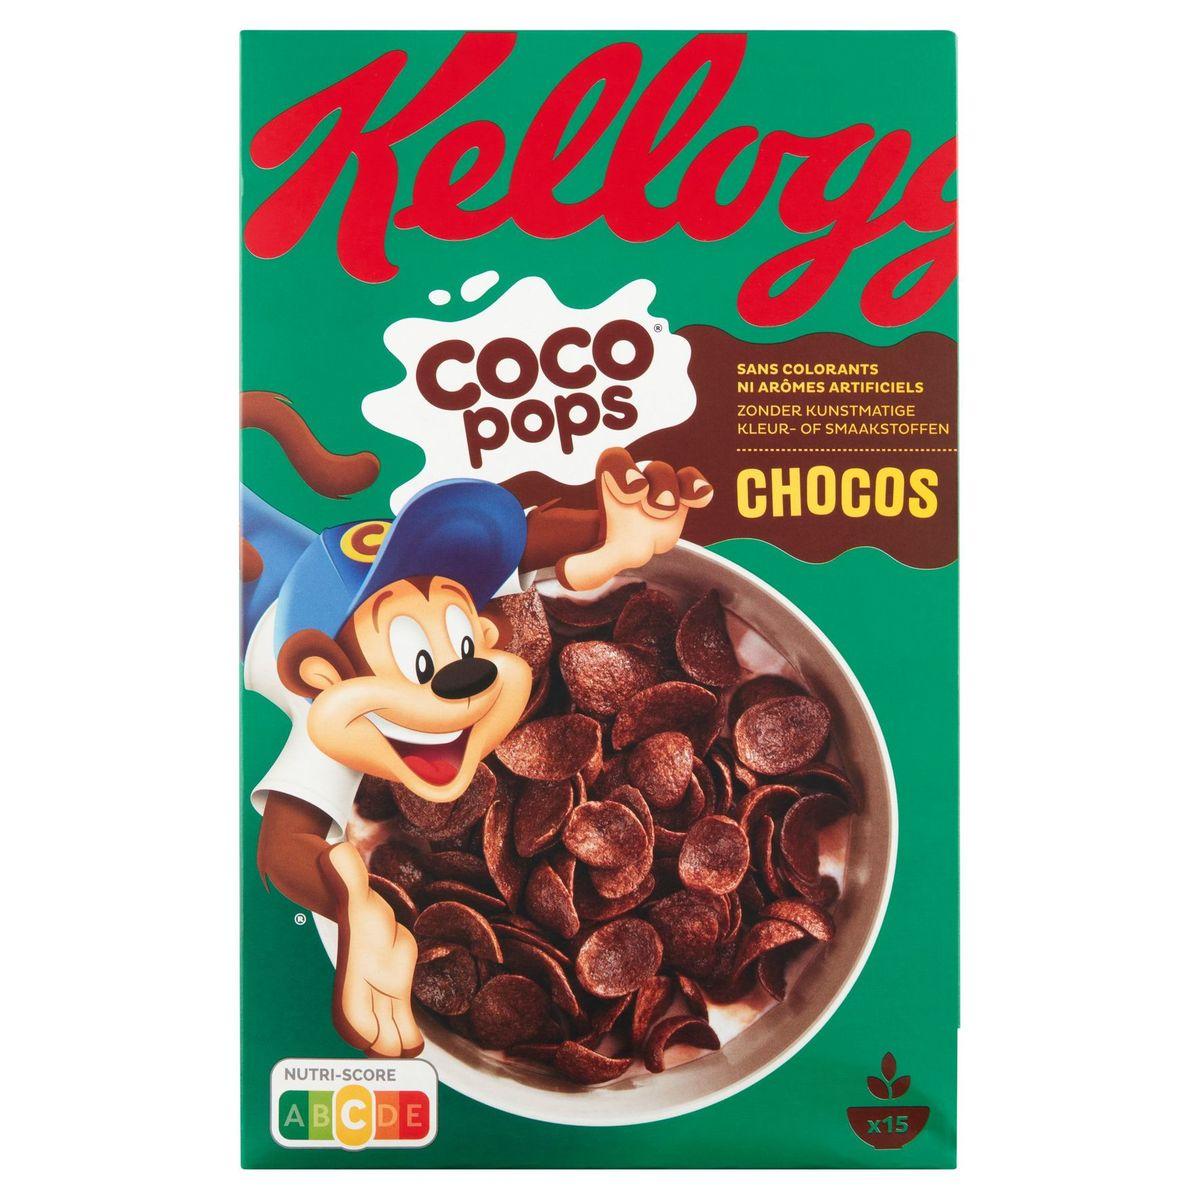 Kellogg's Coco Pops Chocos 450 g